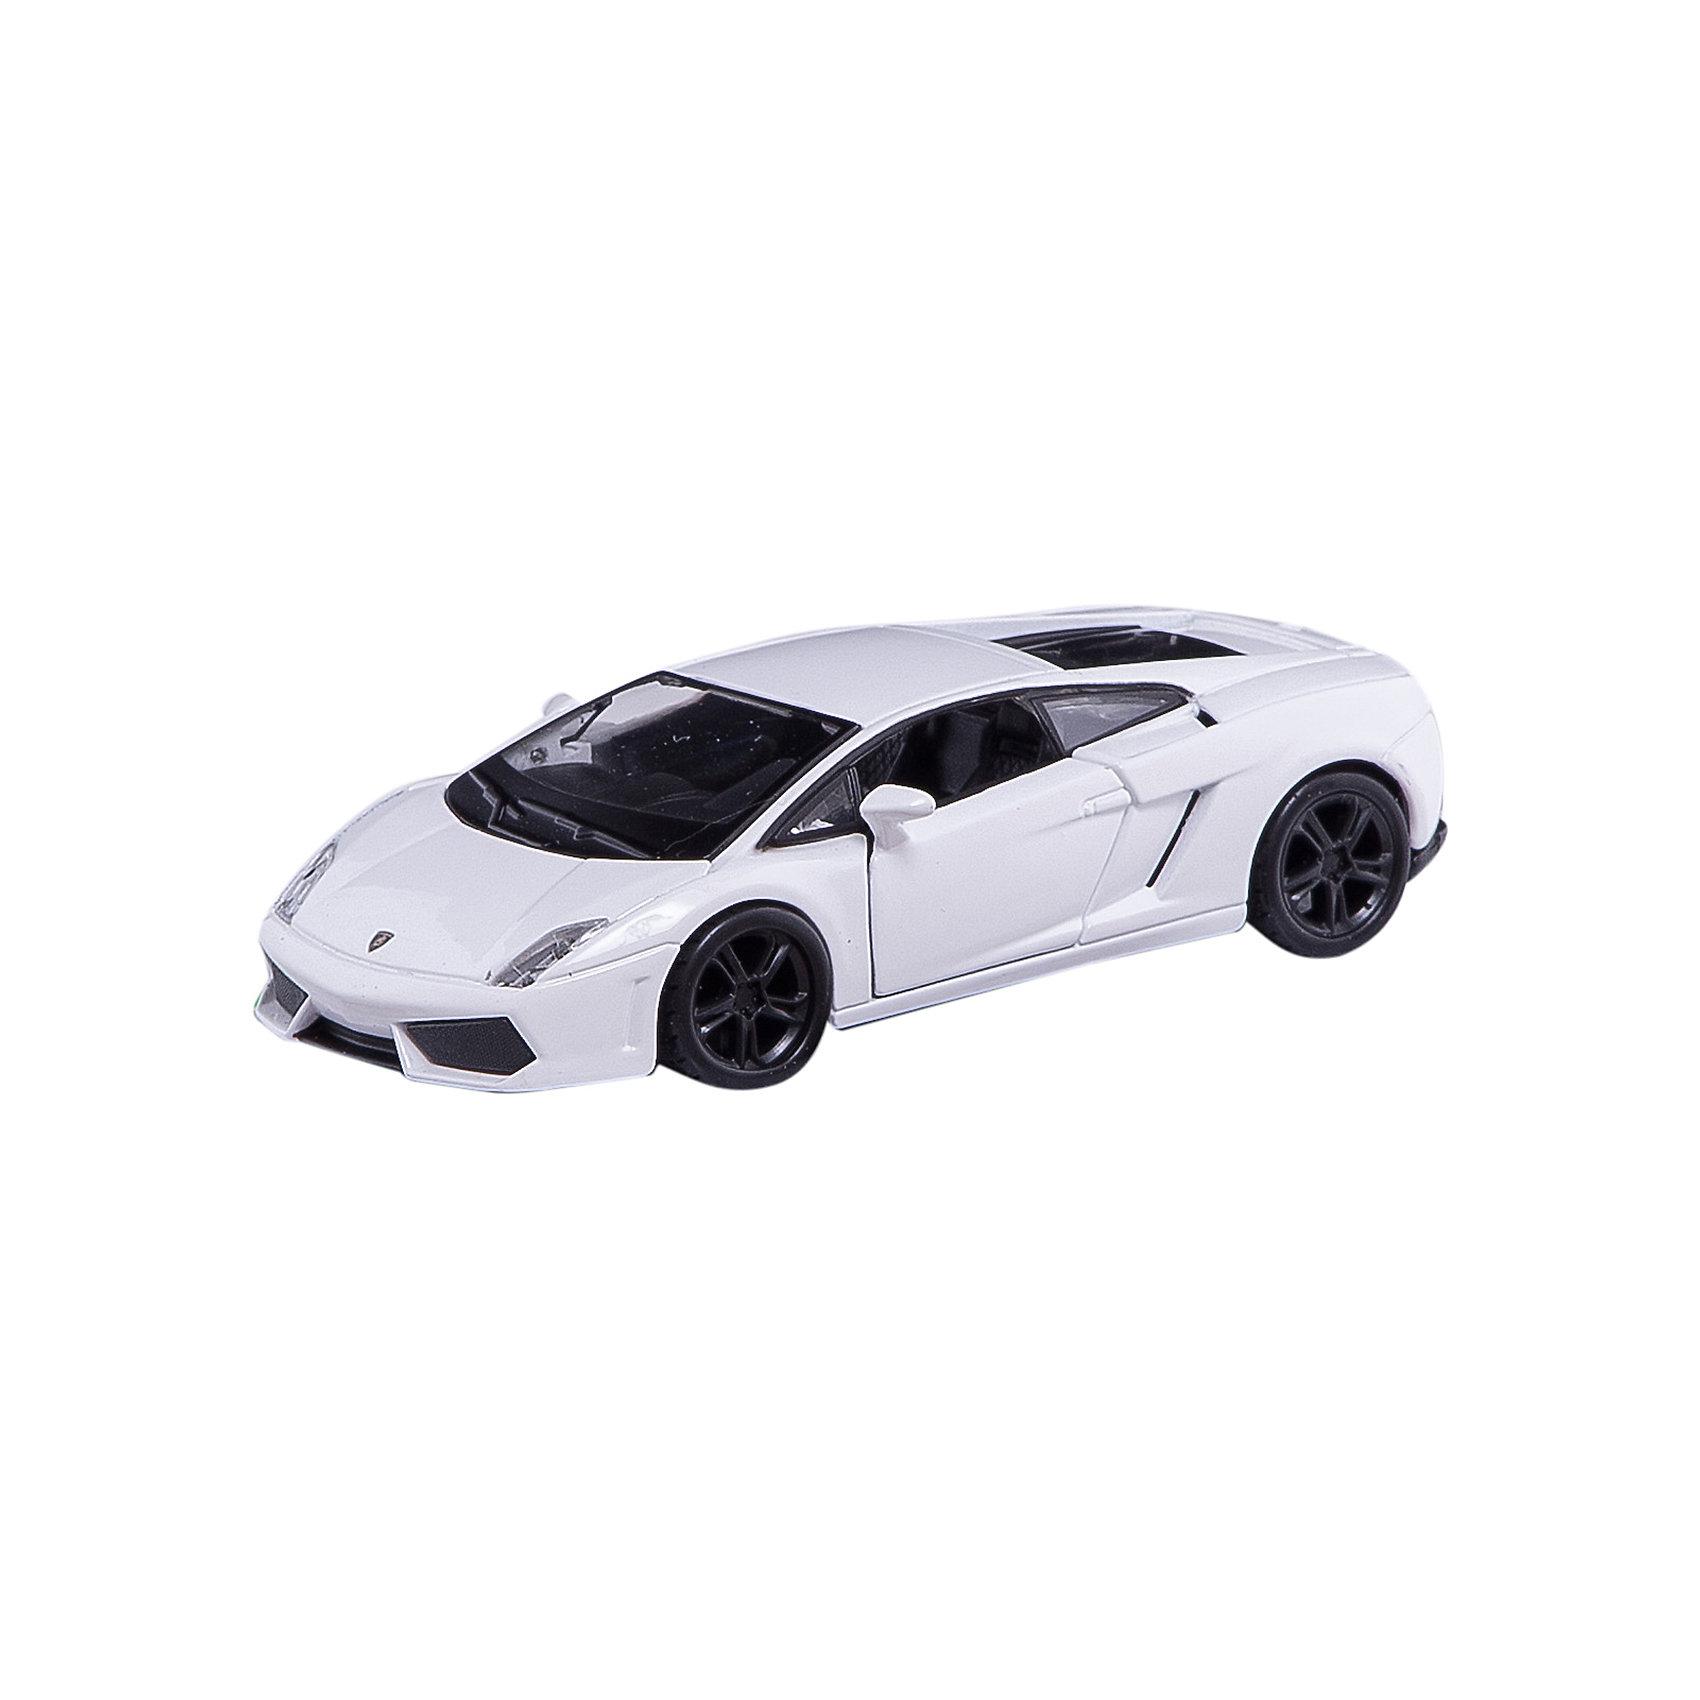 Машина Lamborghini Gallardo, 1:32, белая, Bburago<br><br>Ширина мм: 270<br>Глубина мм: 230<br>Высота мм: 90<br>Вес г: 245<br>Возраст от месяцев: 36<br>Возраст до месяцев: 2147483647<br>Пол: Мужской<br>Возраст: Детский<br>SKU: 5156835